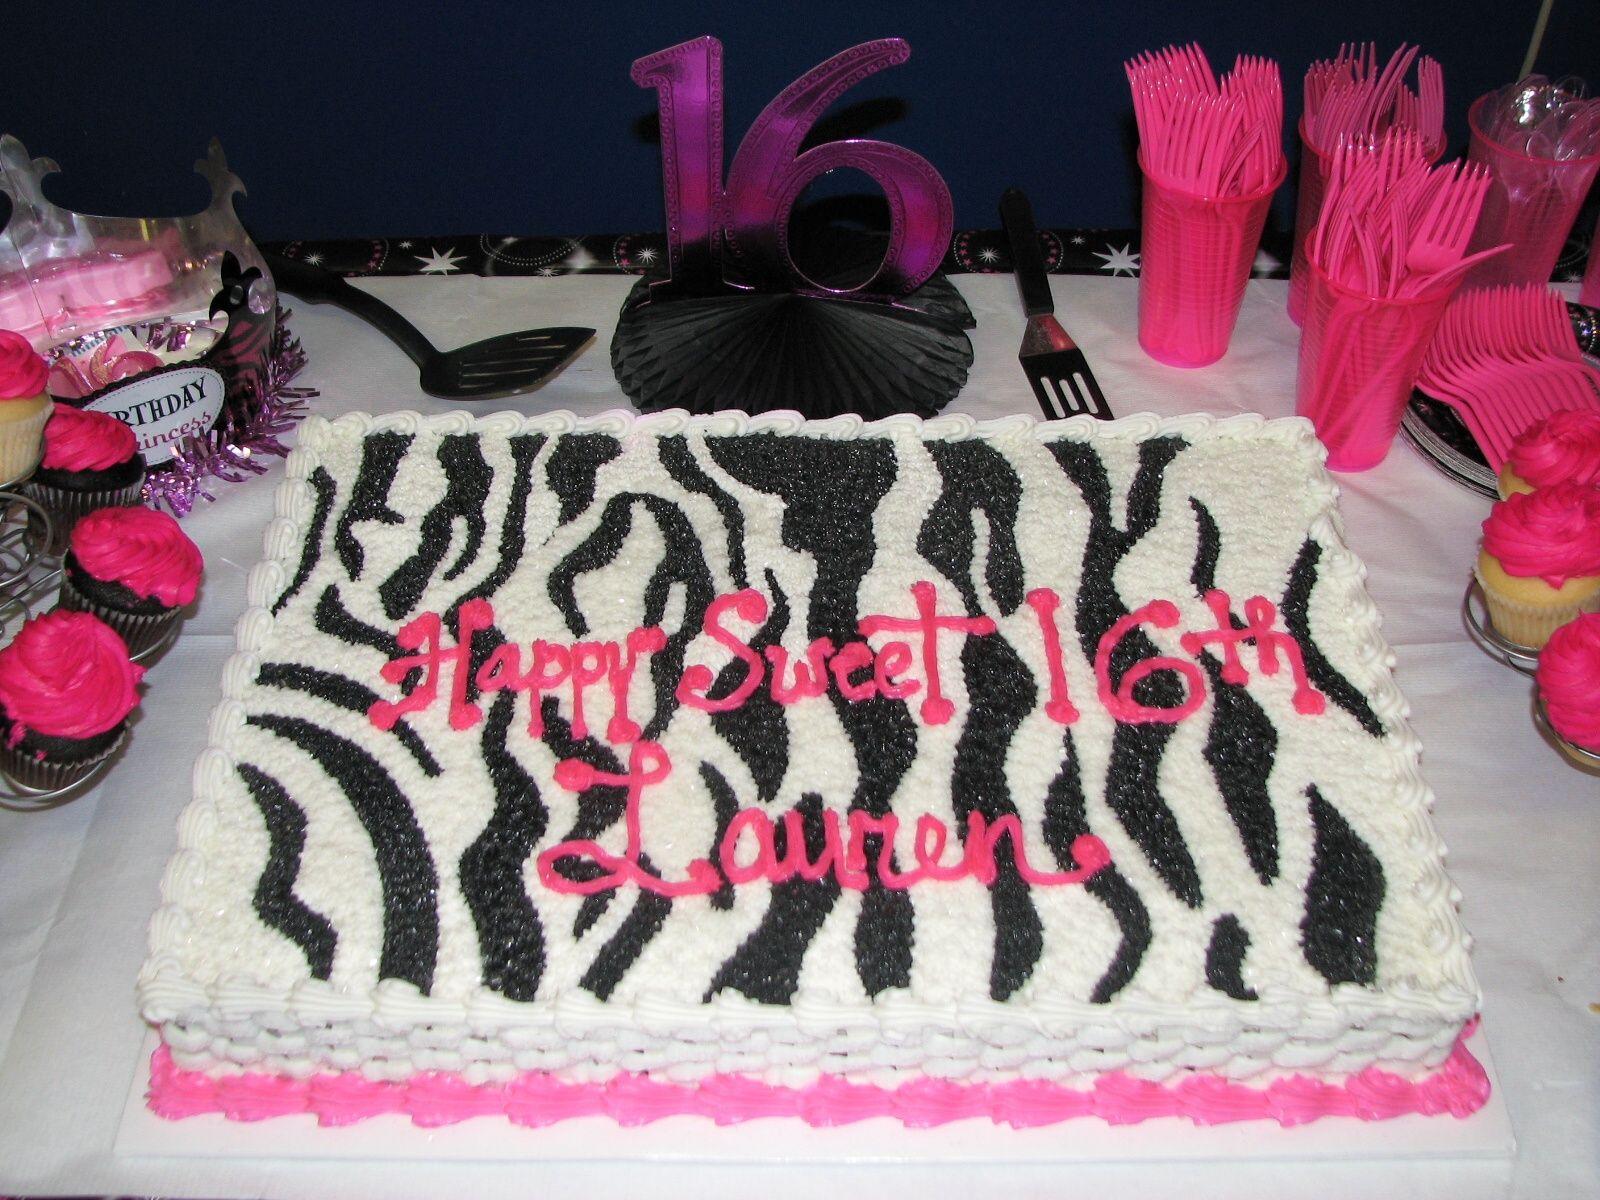 pink+zebra+birthday+cake | birthday cake with zebra and hot pink